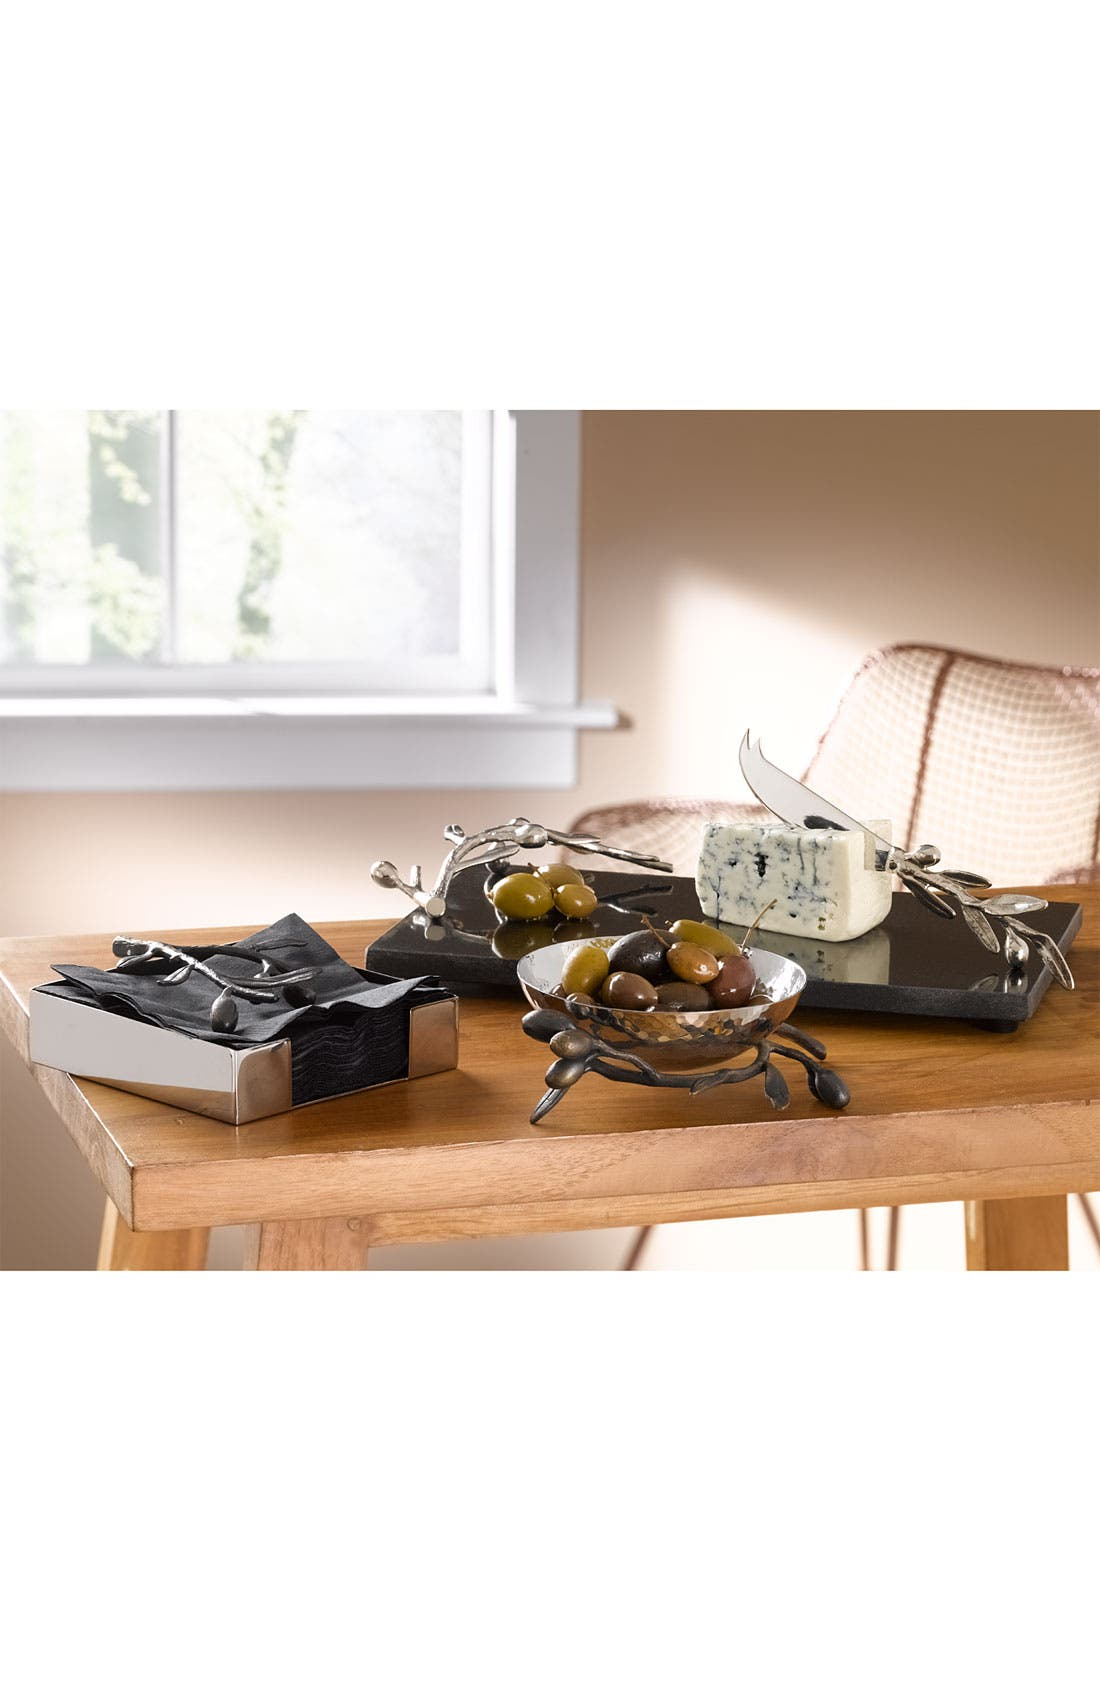 Alternate Image 2  - Michael Aram 'Olive Branch' Cheese Knife Set